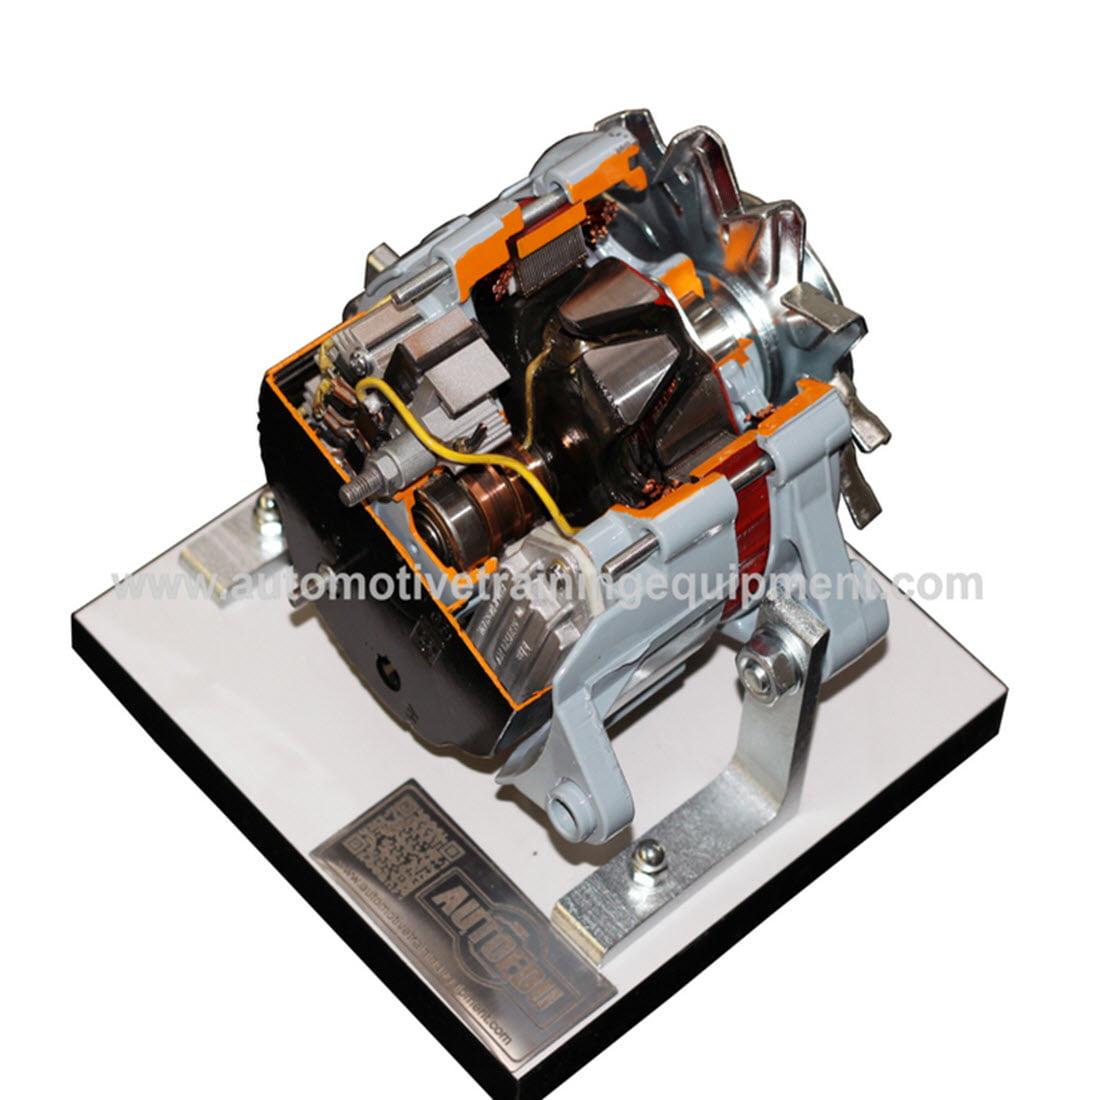 Carbon Zapp Gdi Injector Test Bench Gd1r For Sale Com Mariachilatemodeldodgedensoalternatorwiringdiagram Alternator Cutaway Single Flow Cooling On Base